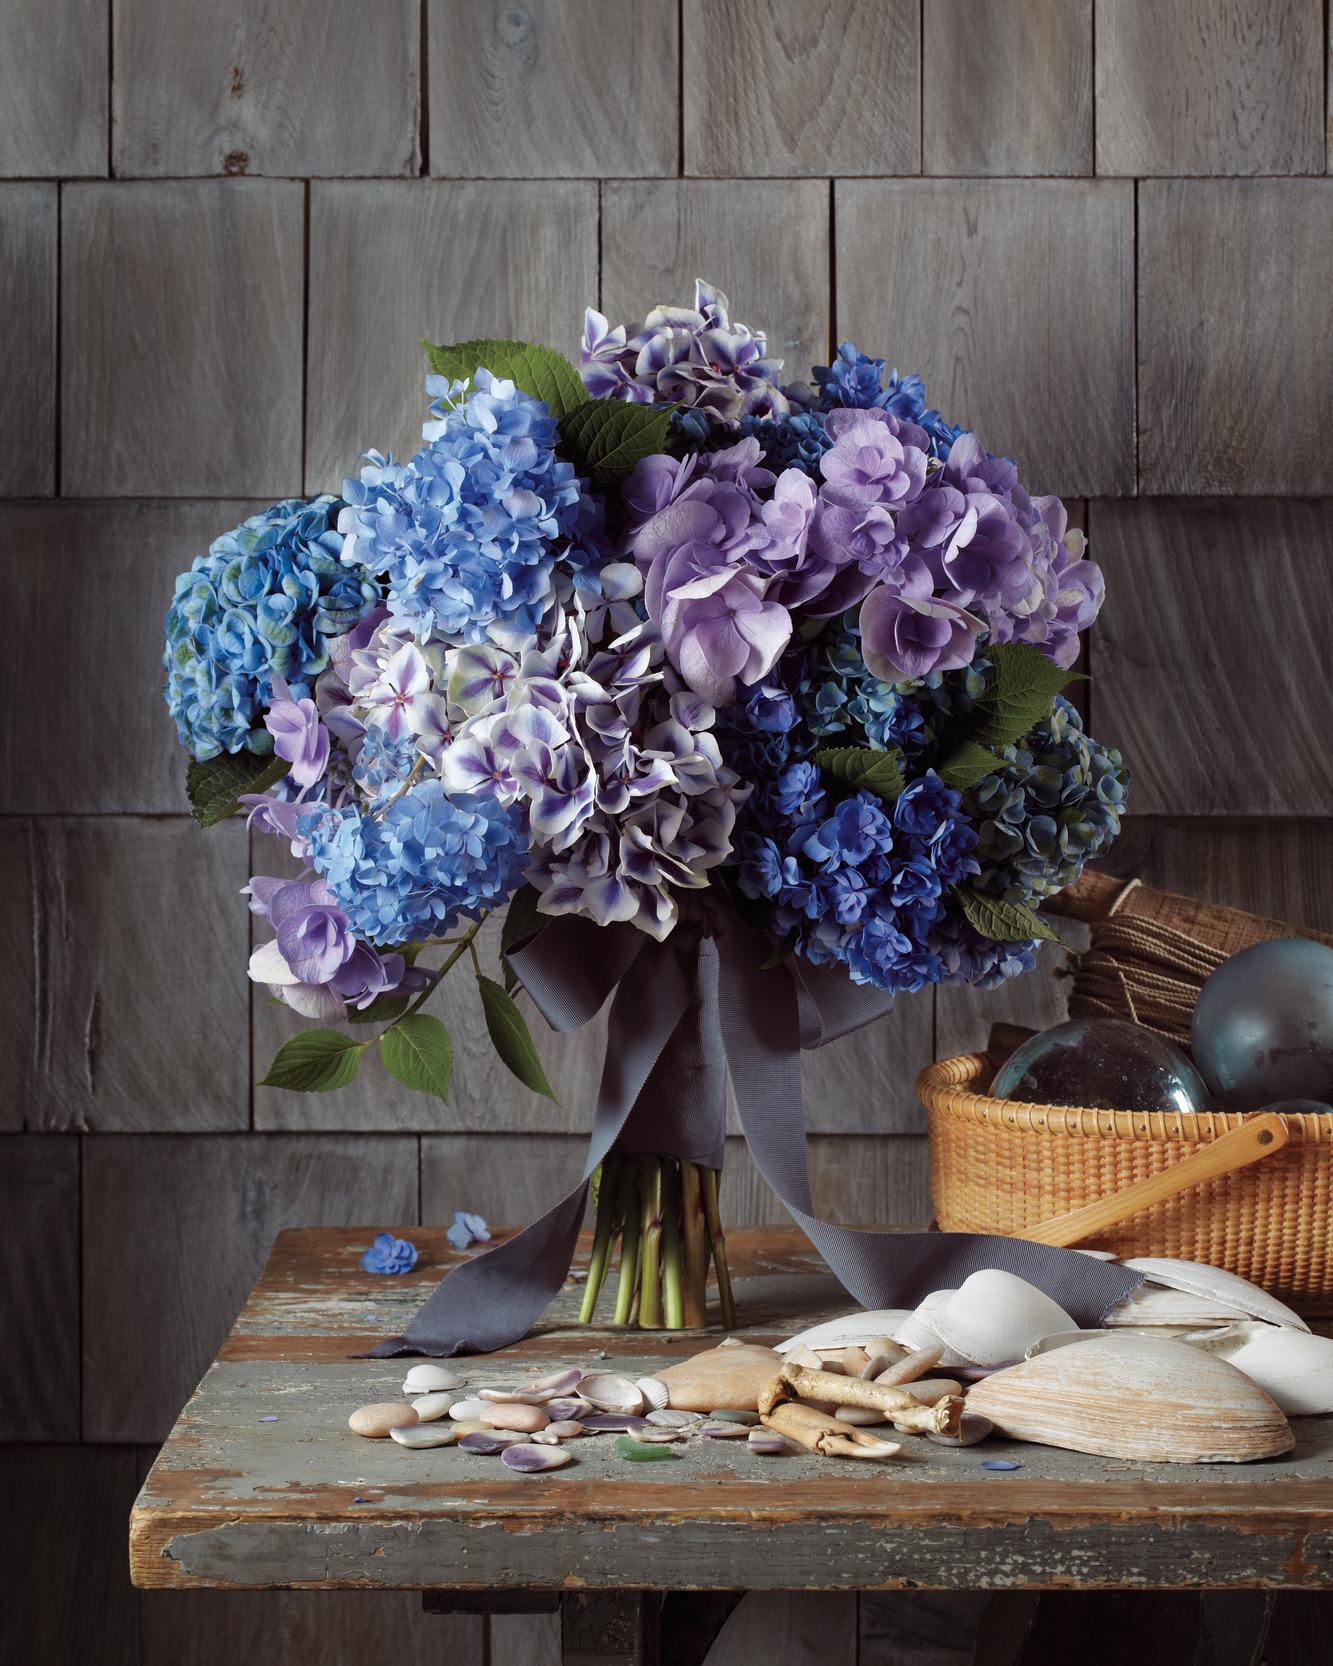 flowers-preppy-coastal-356-mwd108999.jpg